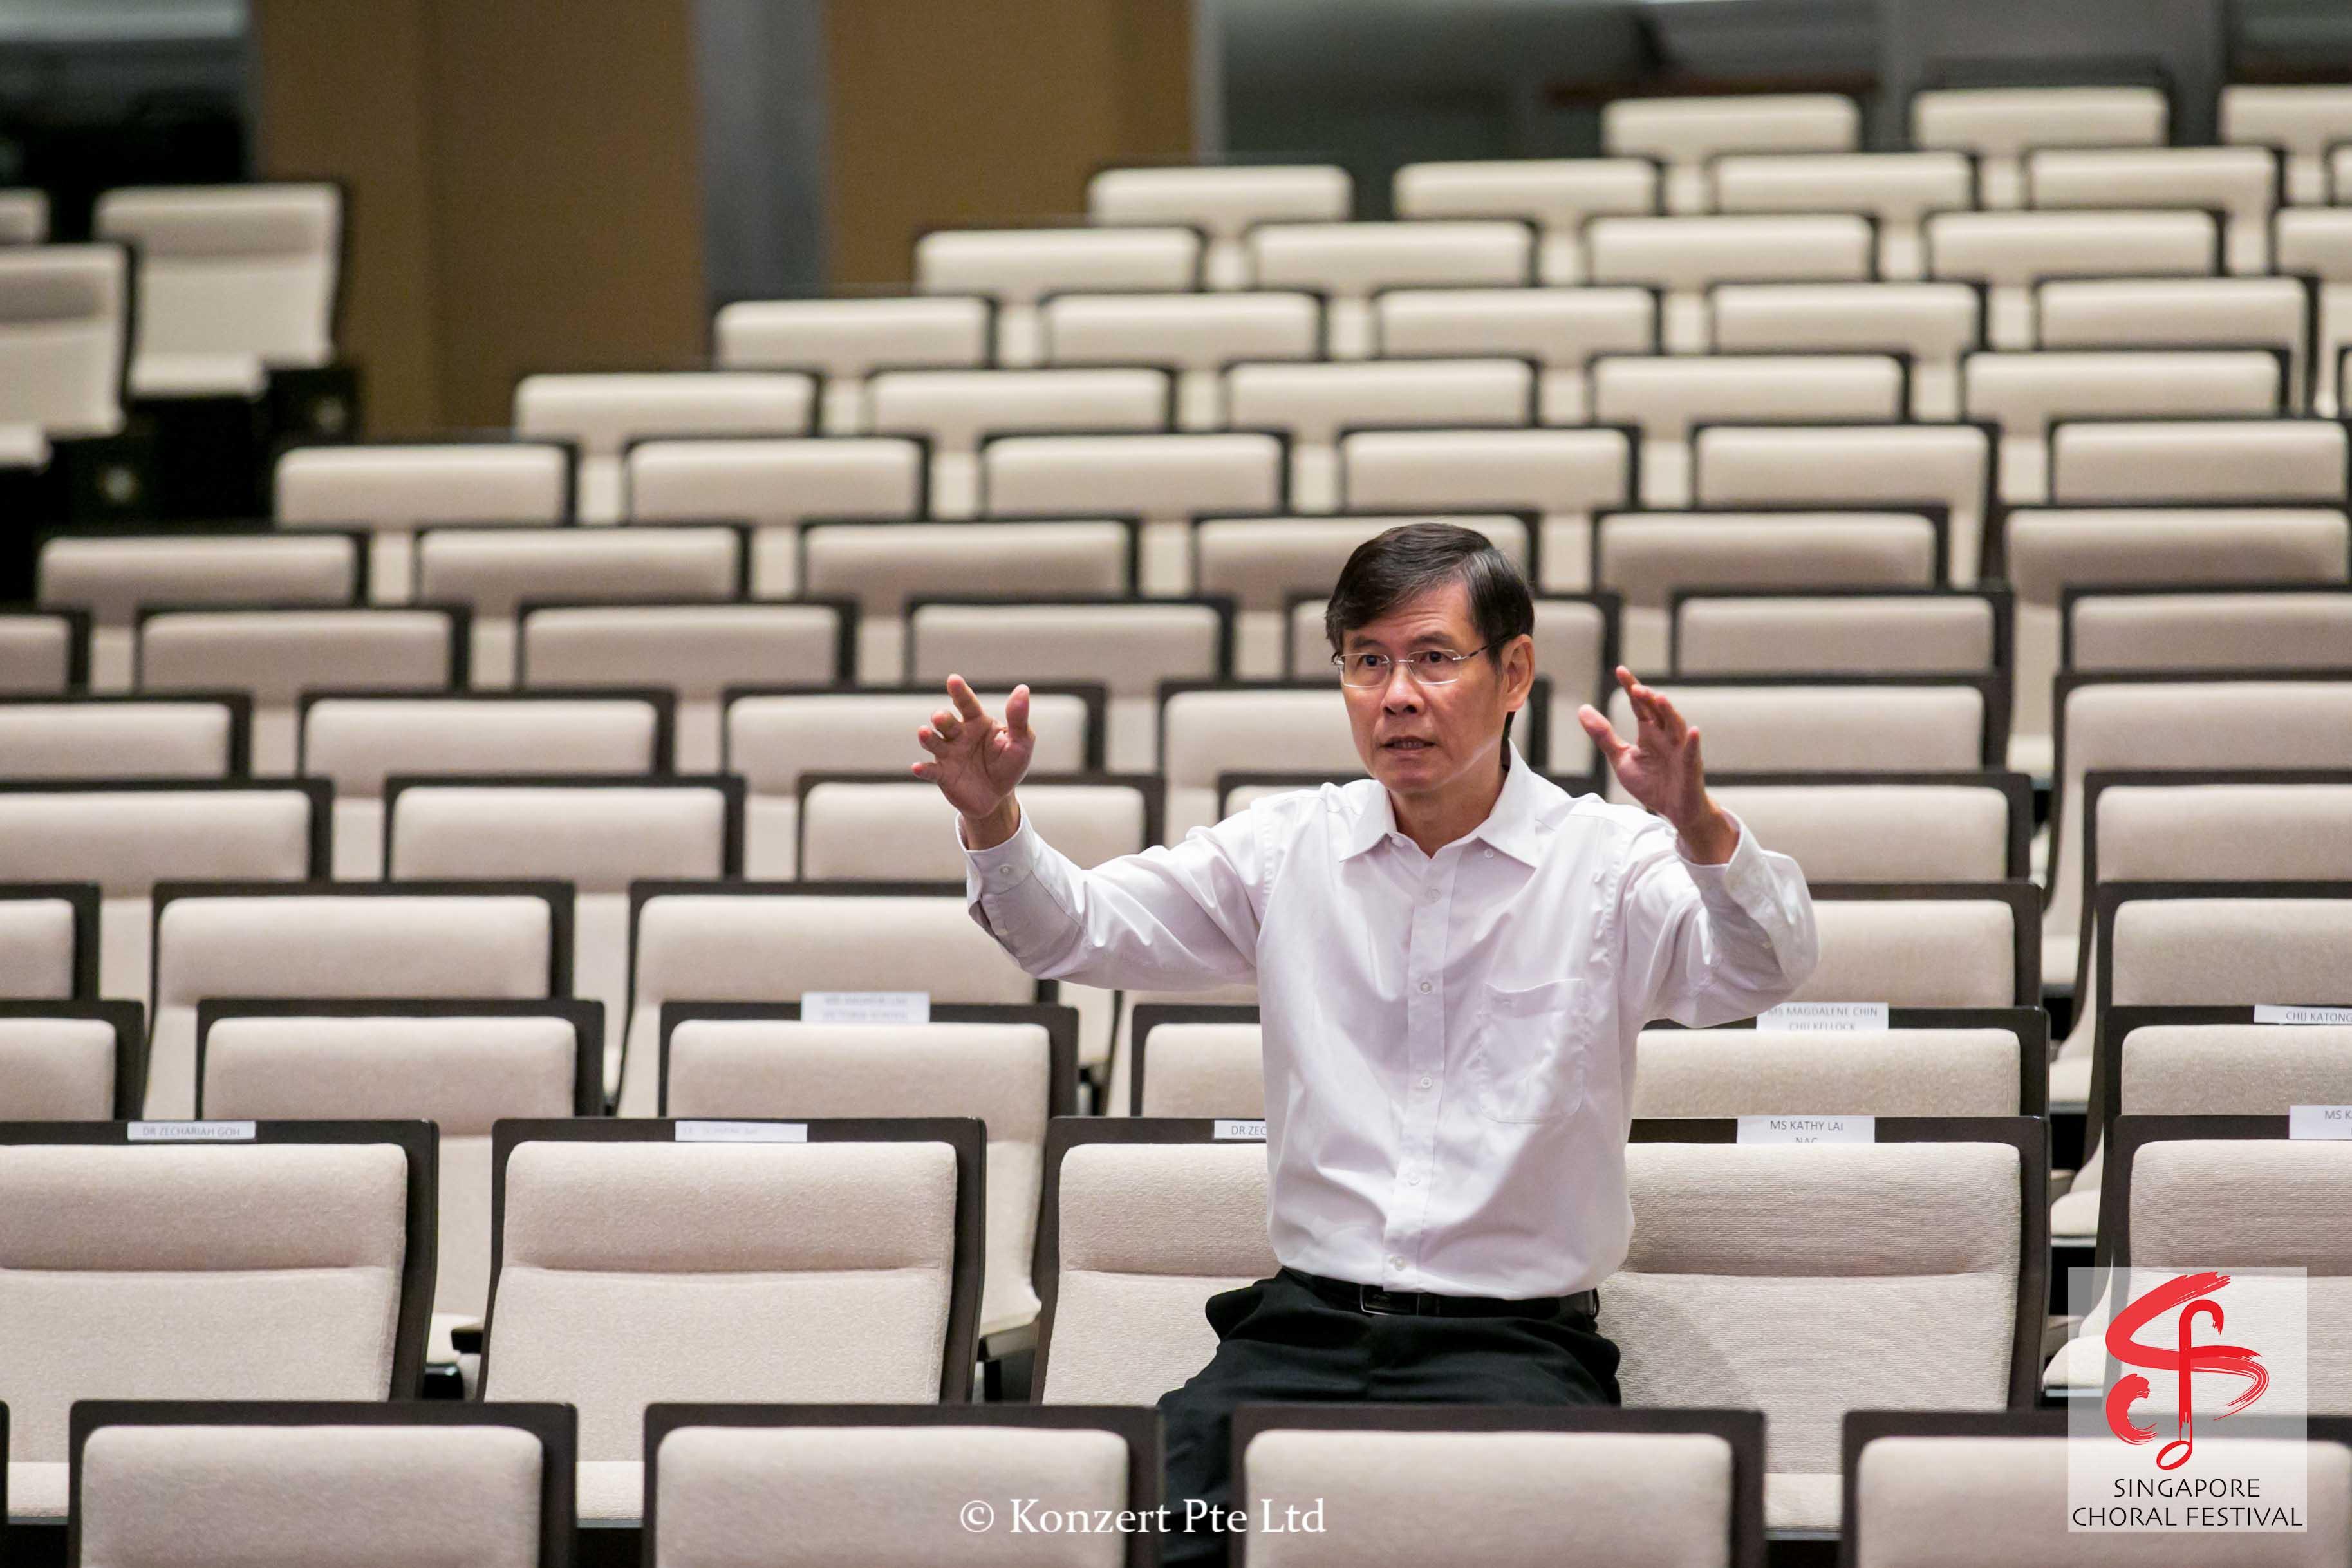 Singapore Choral Festival 8-8-15 (26).jpg